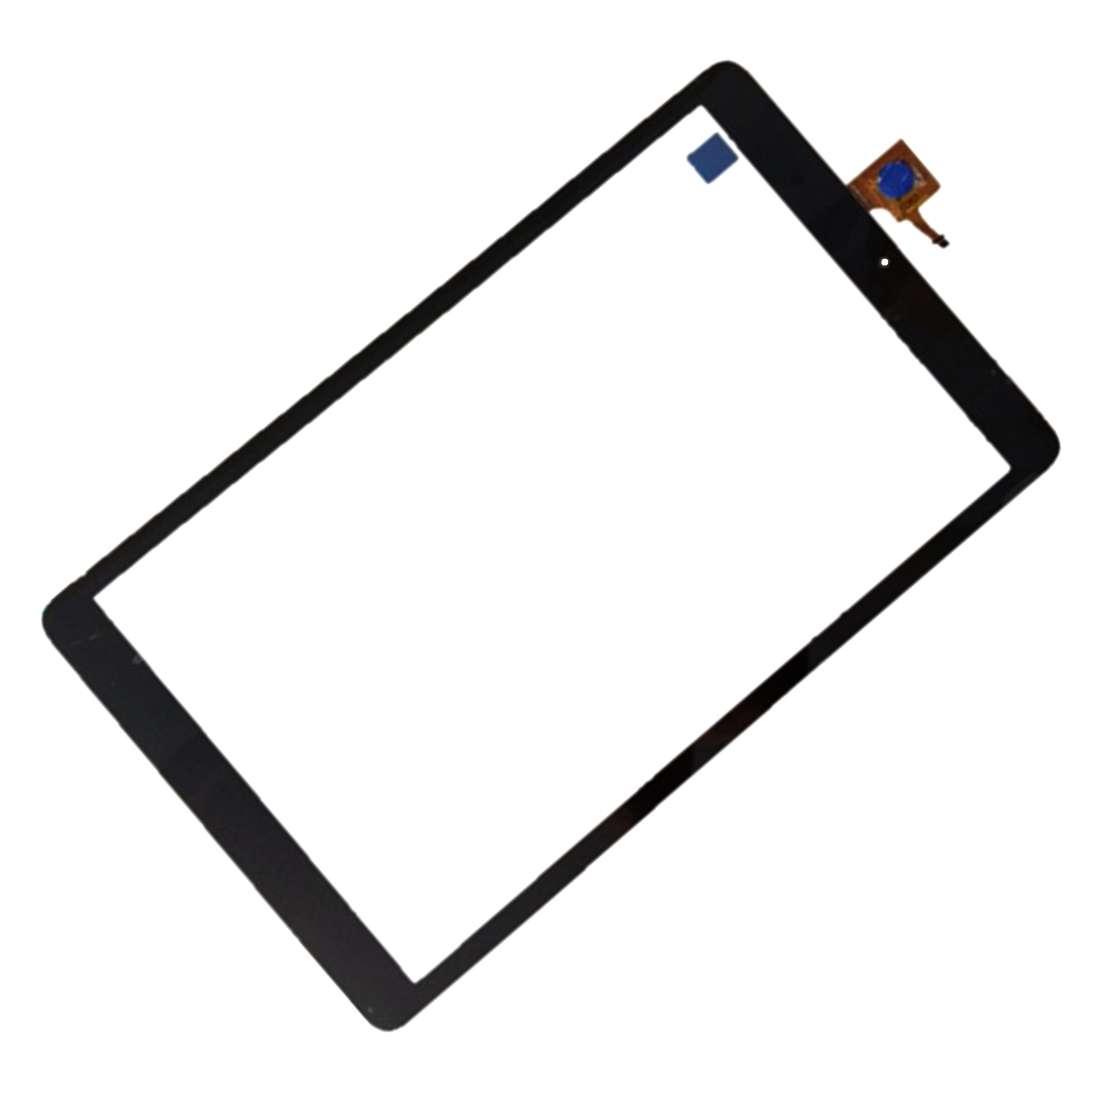 Touchscreen Digitizer Allview Viva H1002 LTE Geam Sticla Tableta imagine powerlaptop.ro 2021